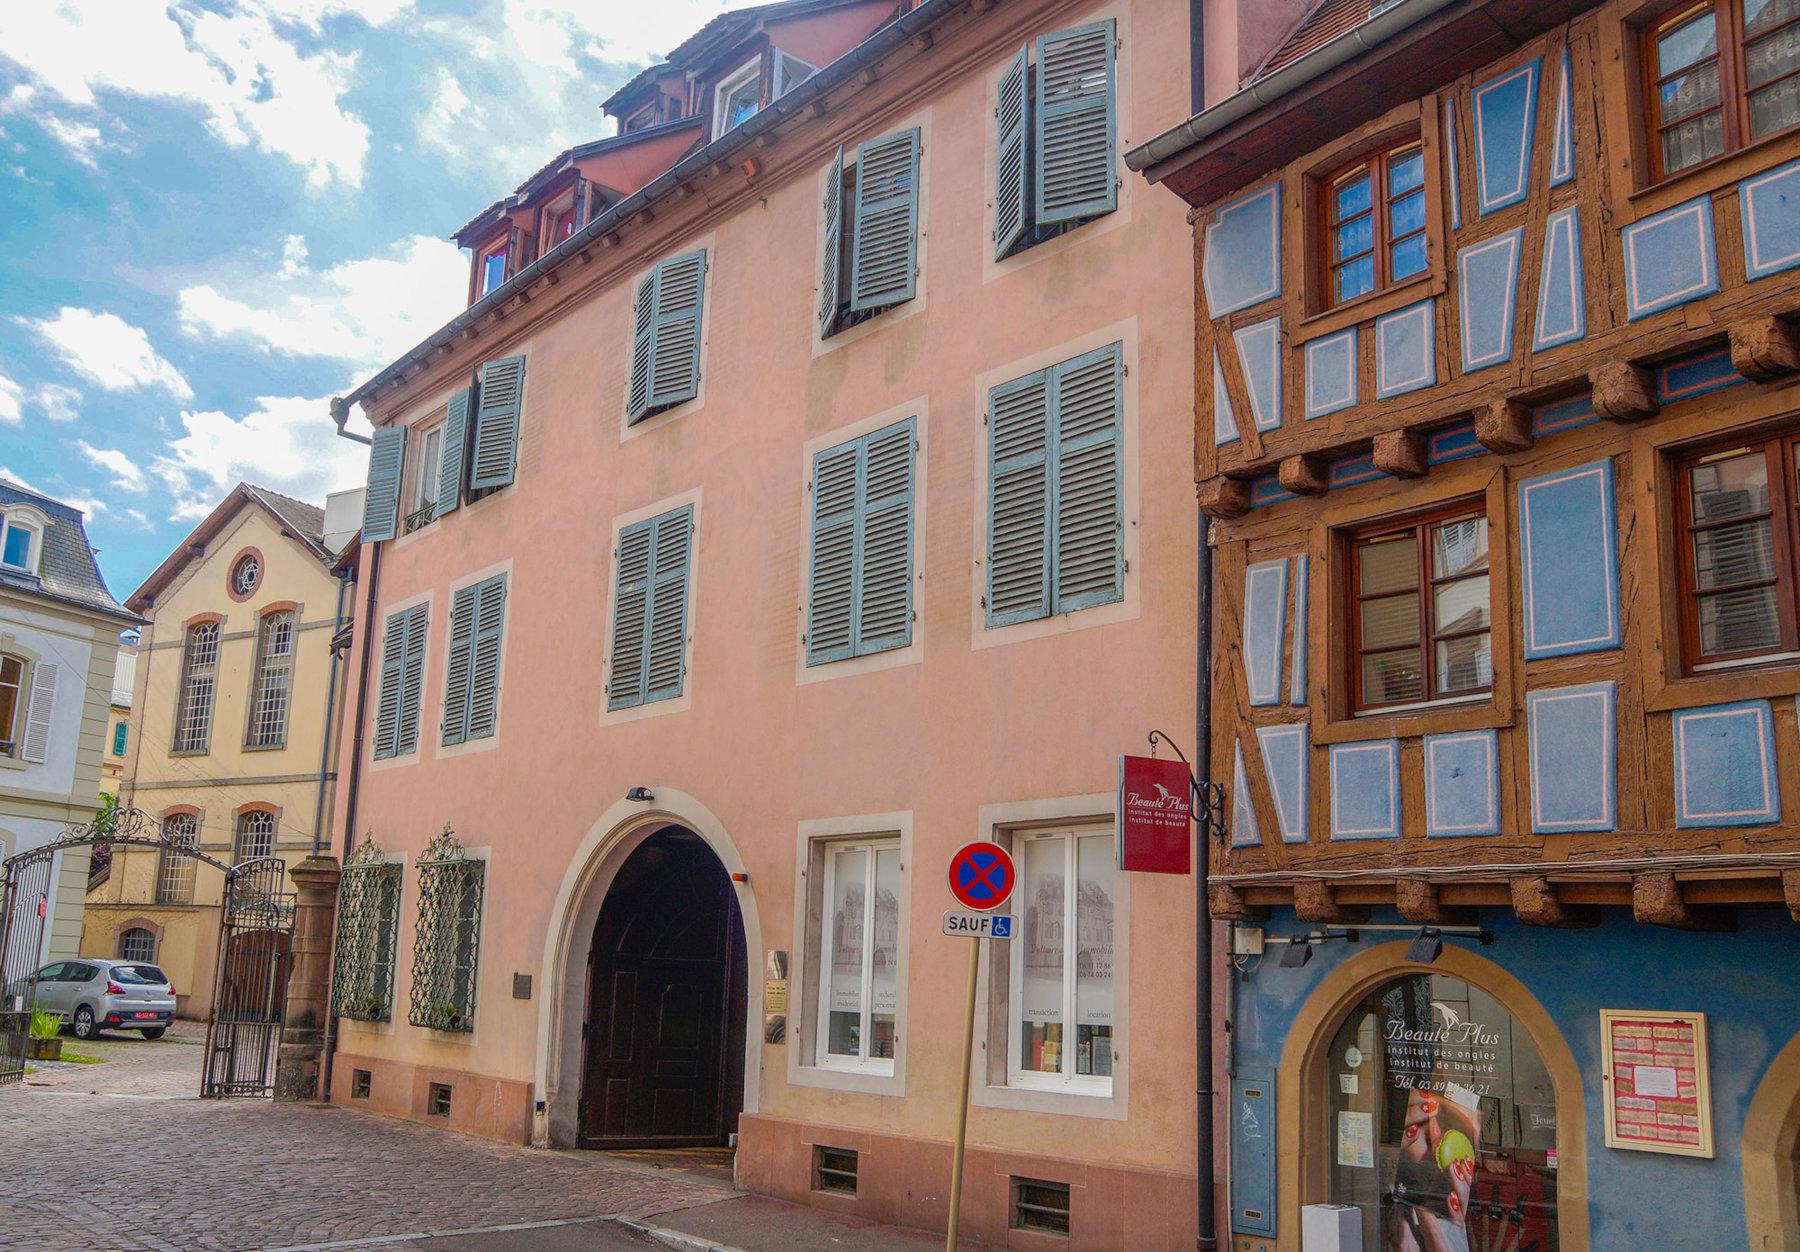 Maison où séjourna Voltaire